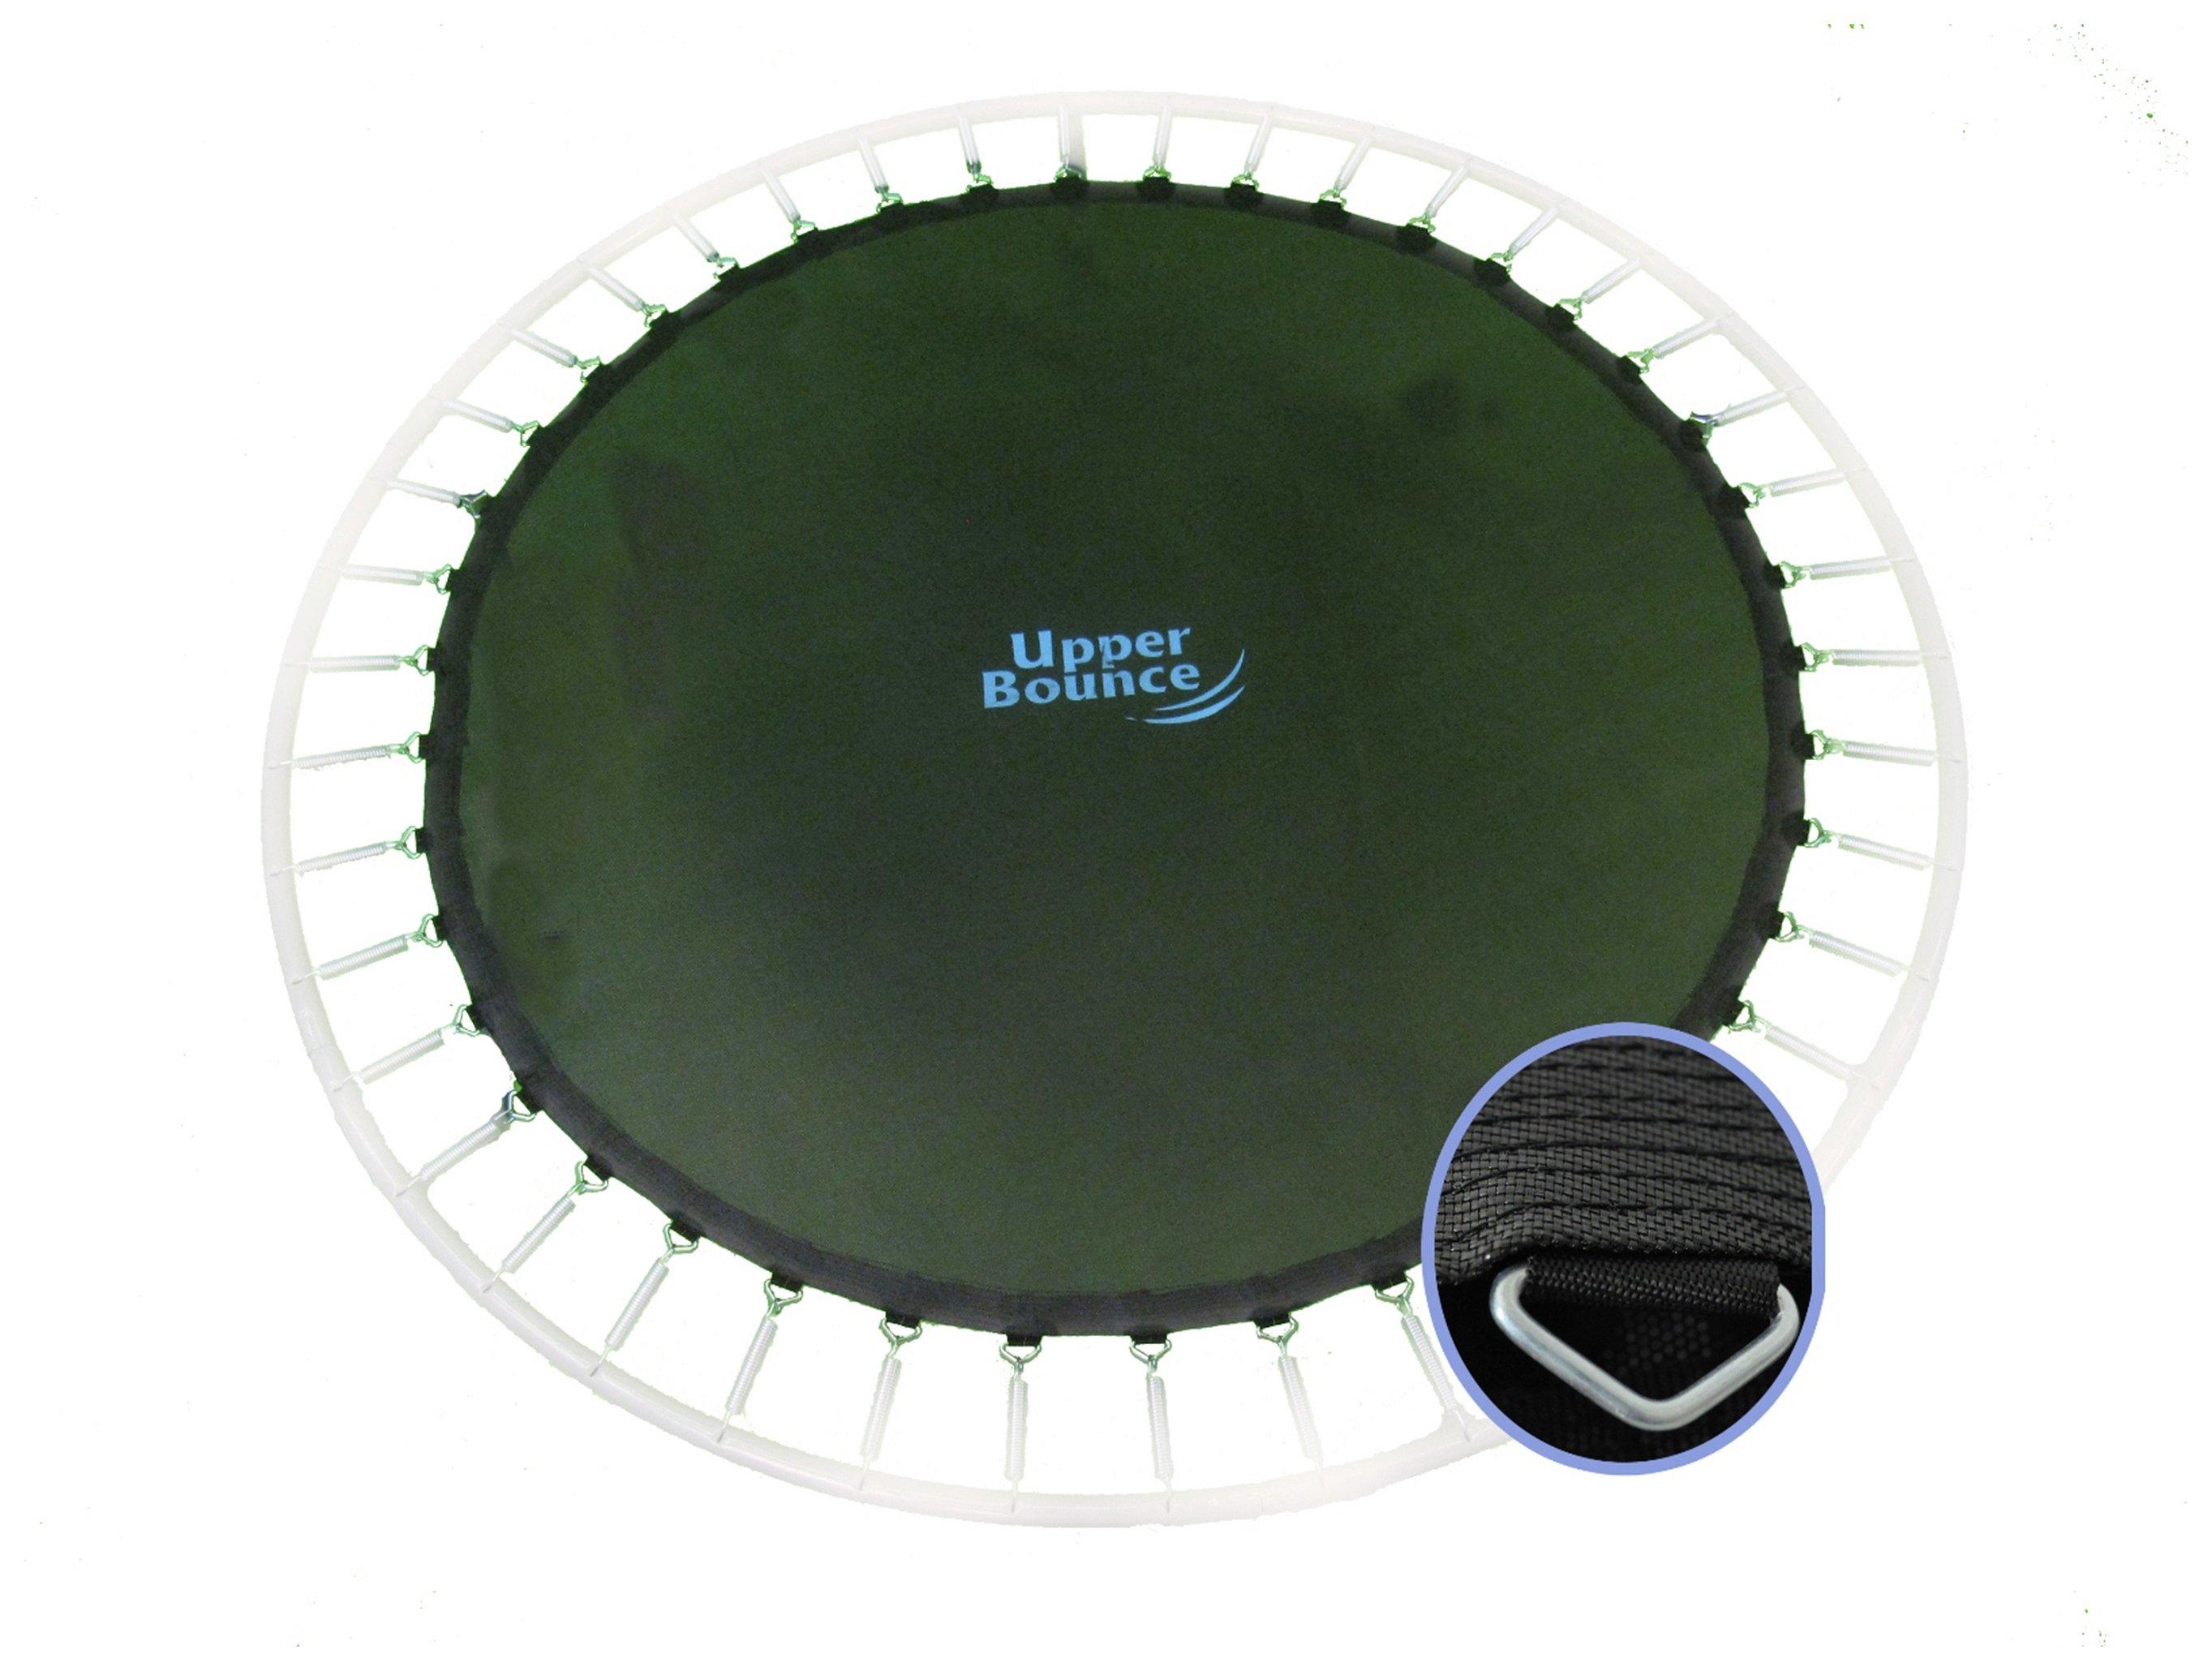 Buy Jumpking 6ft Trampoline Accessory Kit At Argos Co Uk